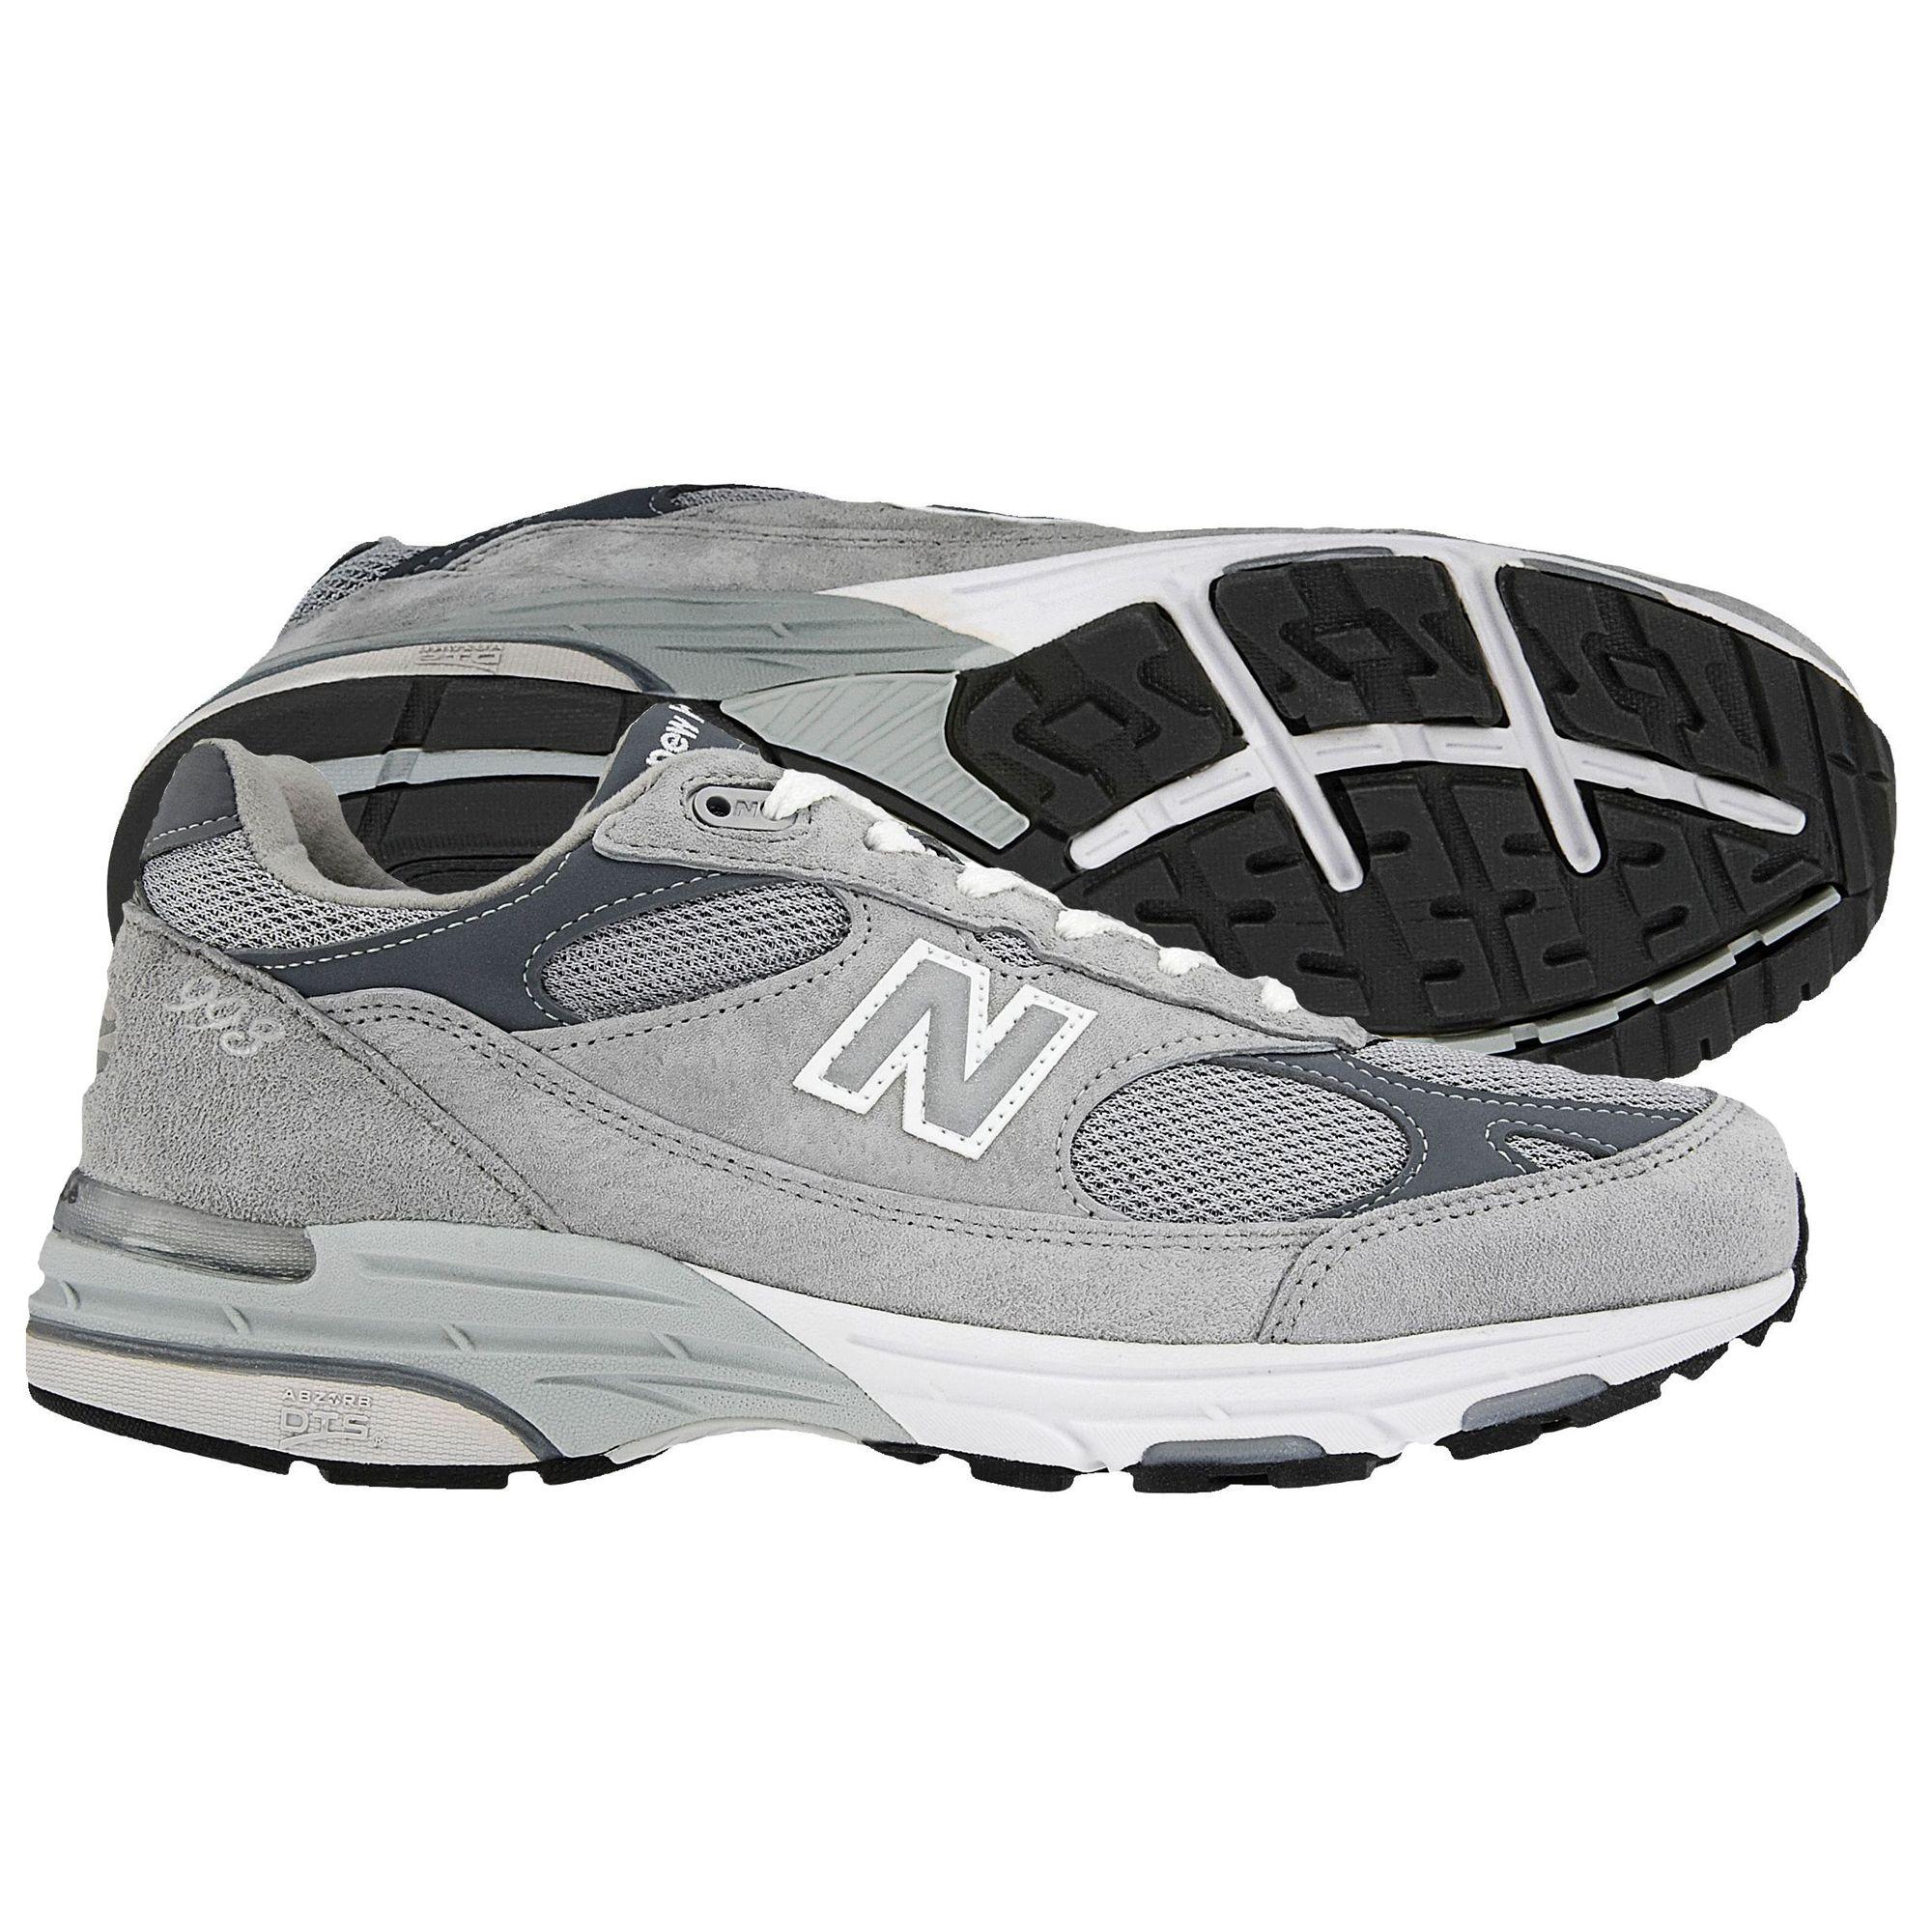 New Balance 933 Mens Running Shoes